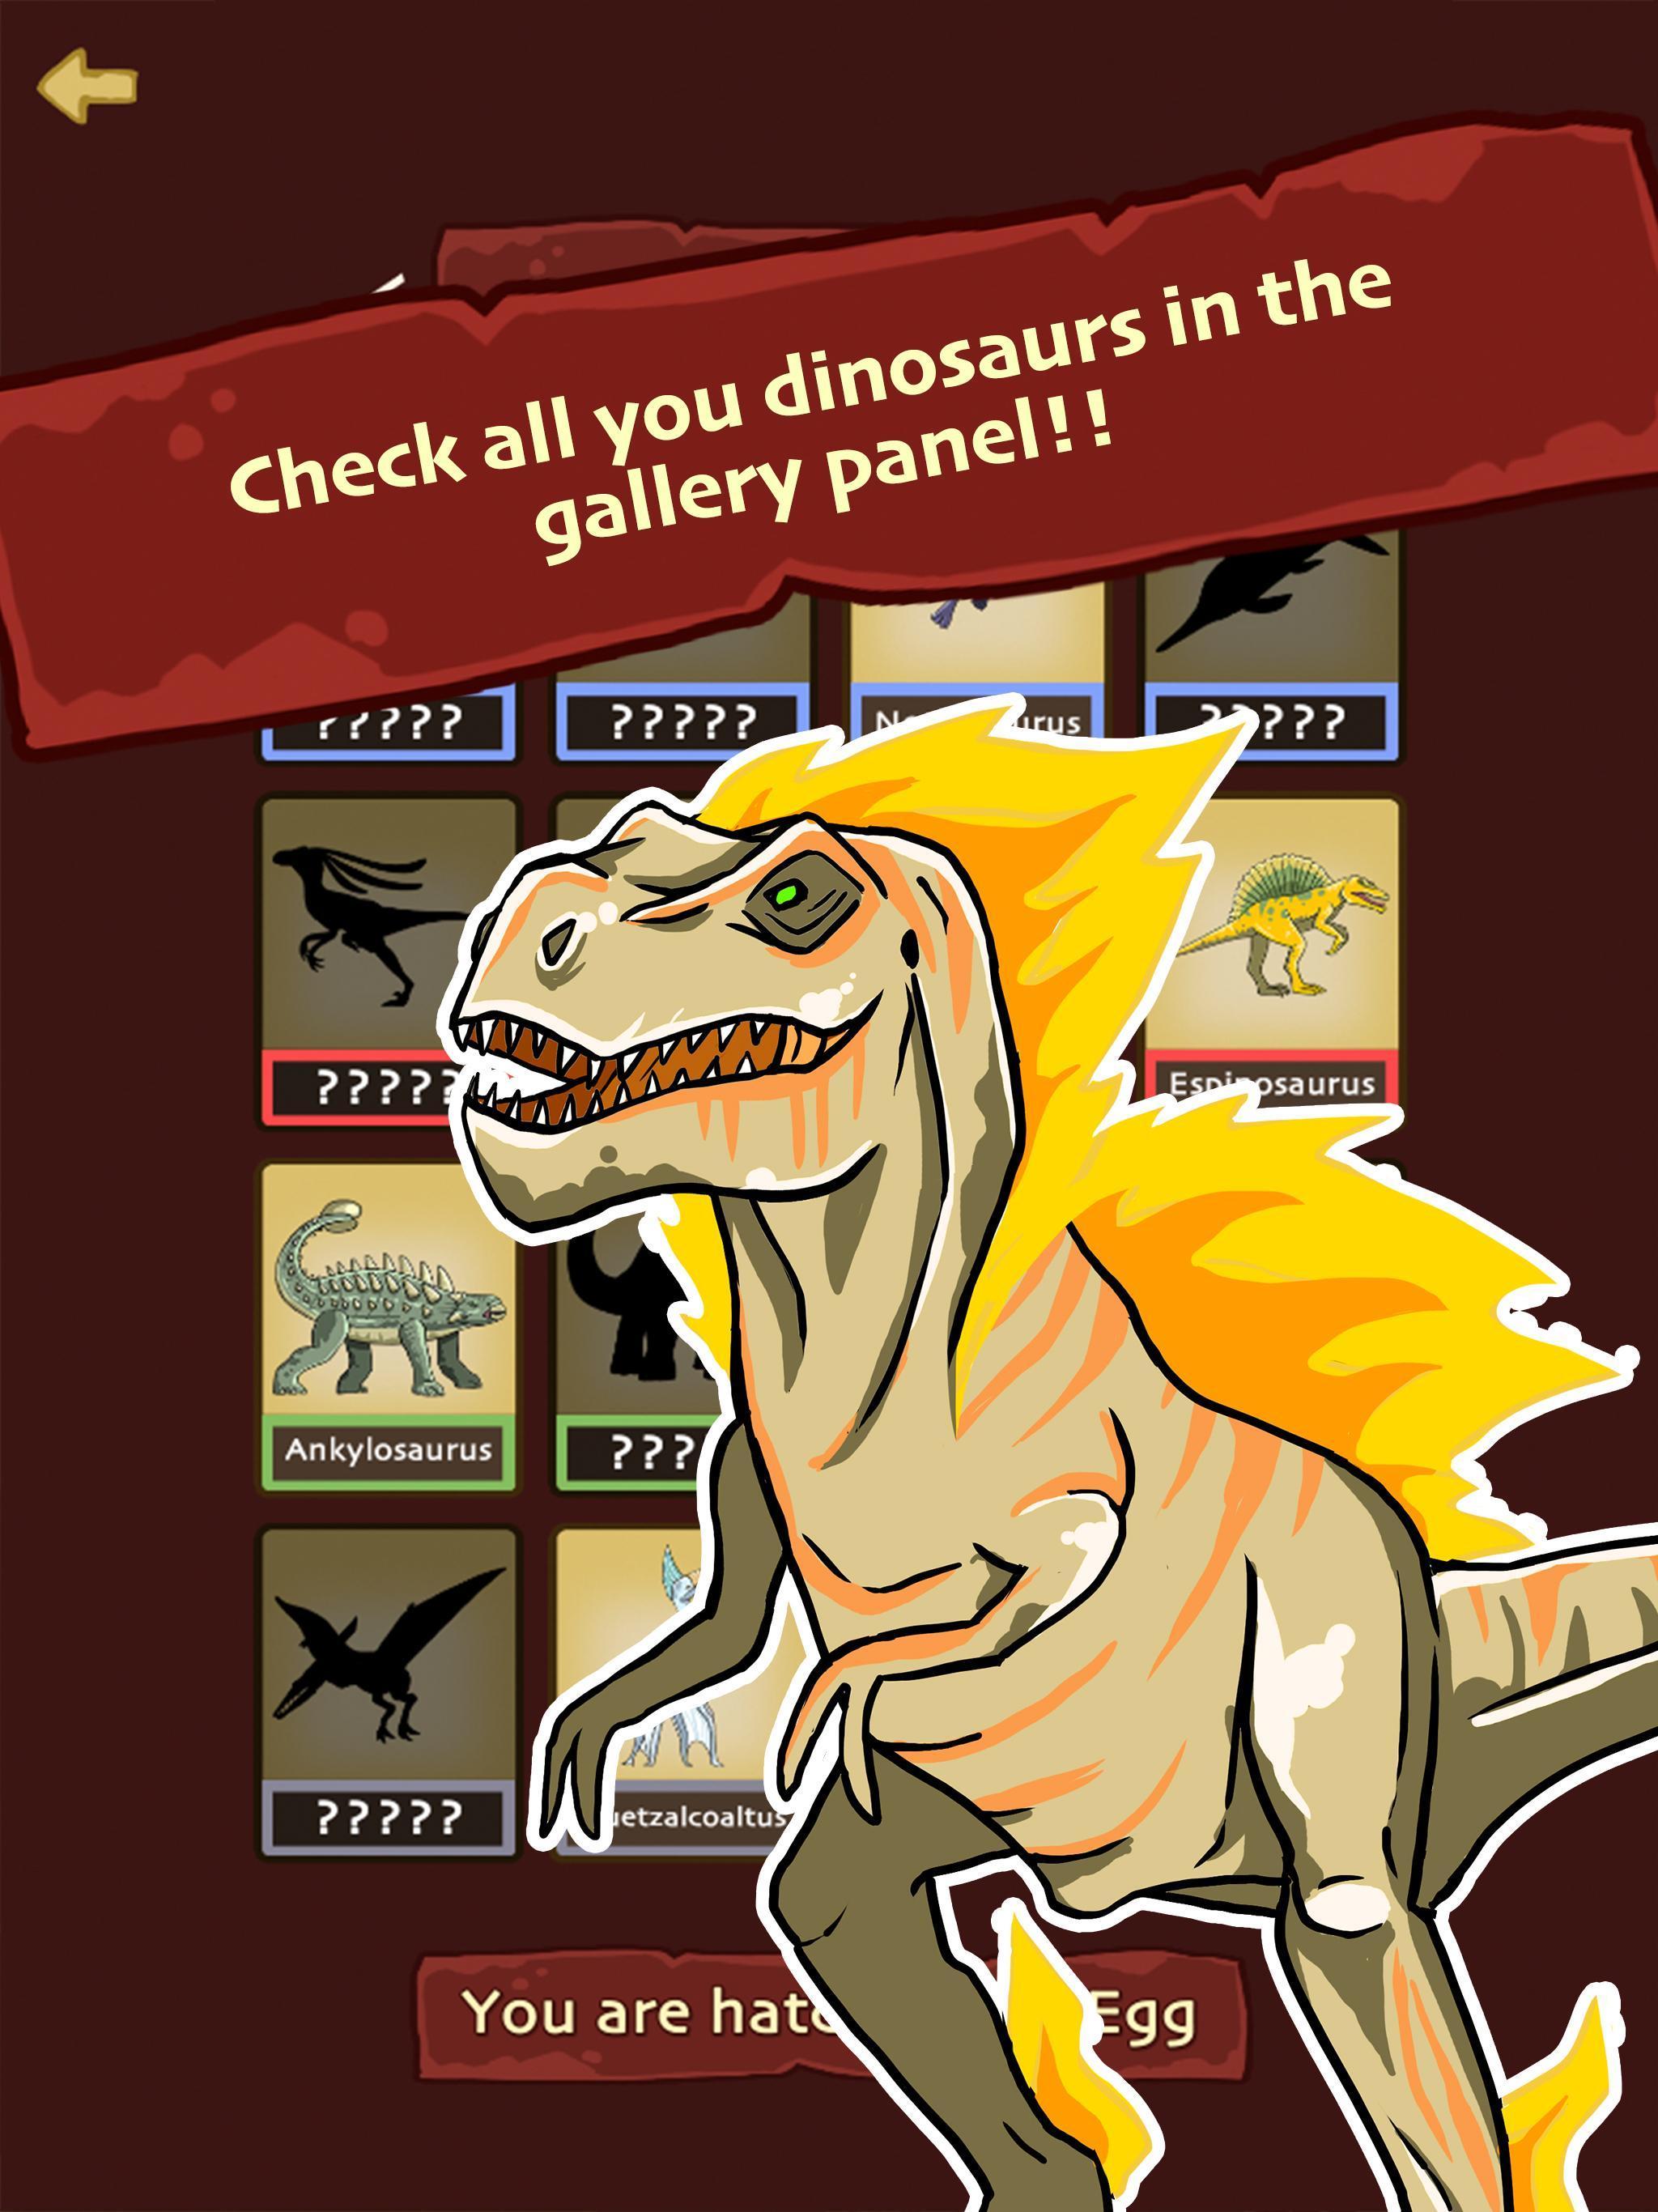 Hatch Dinosaur Eggs - Jurassic World Clicker Games 1.0.7 Screenshot 10